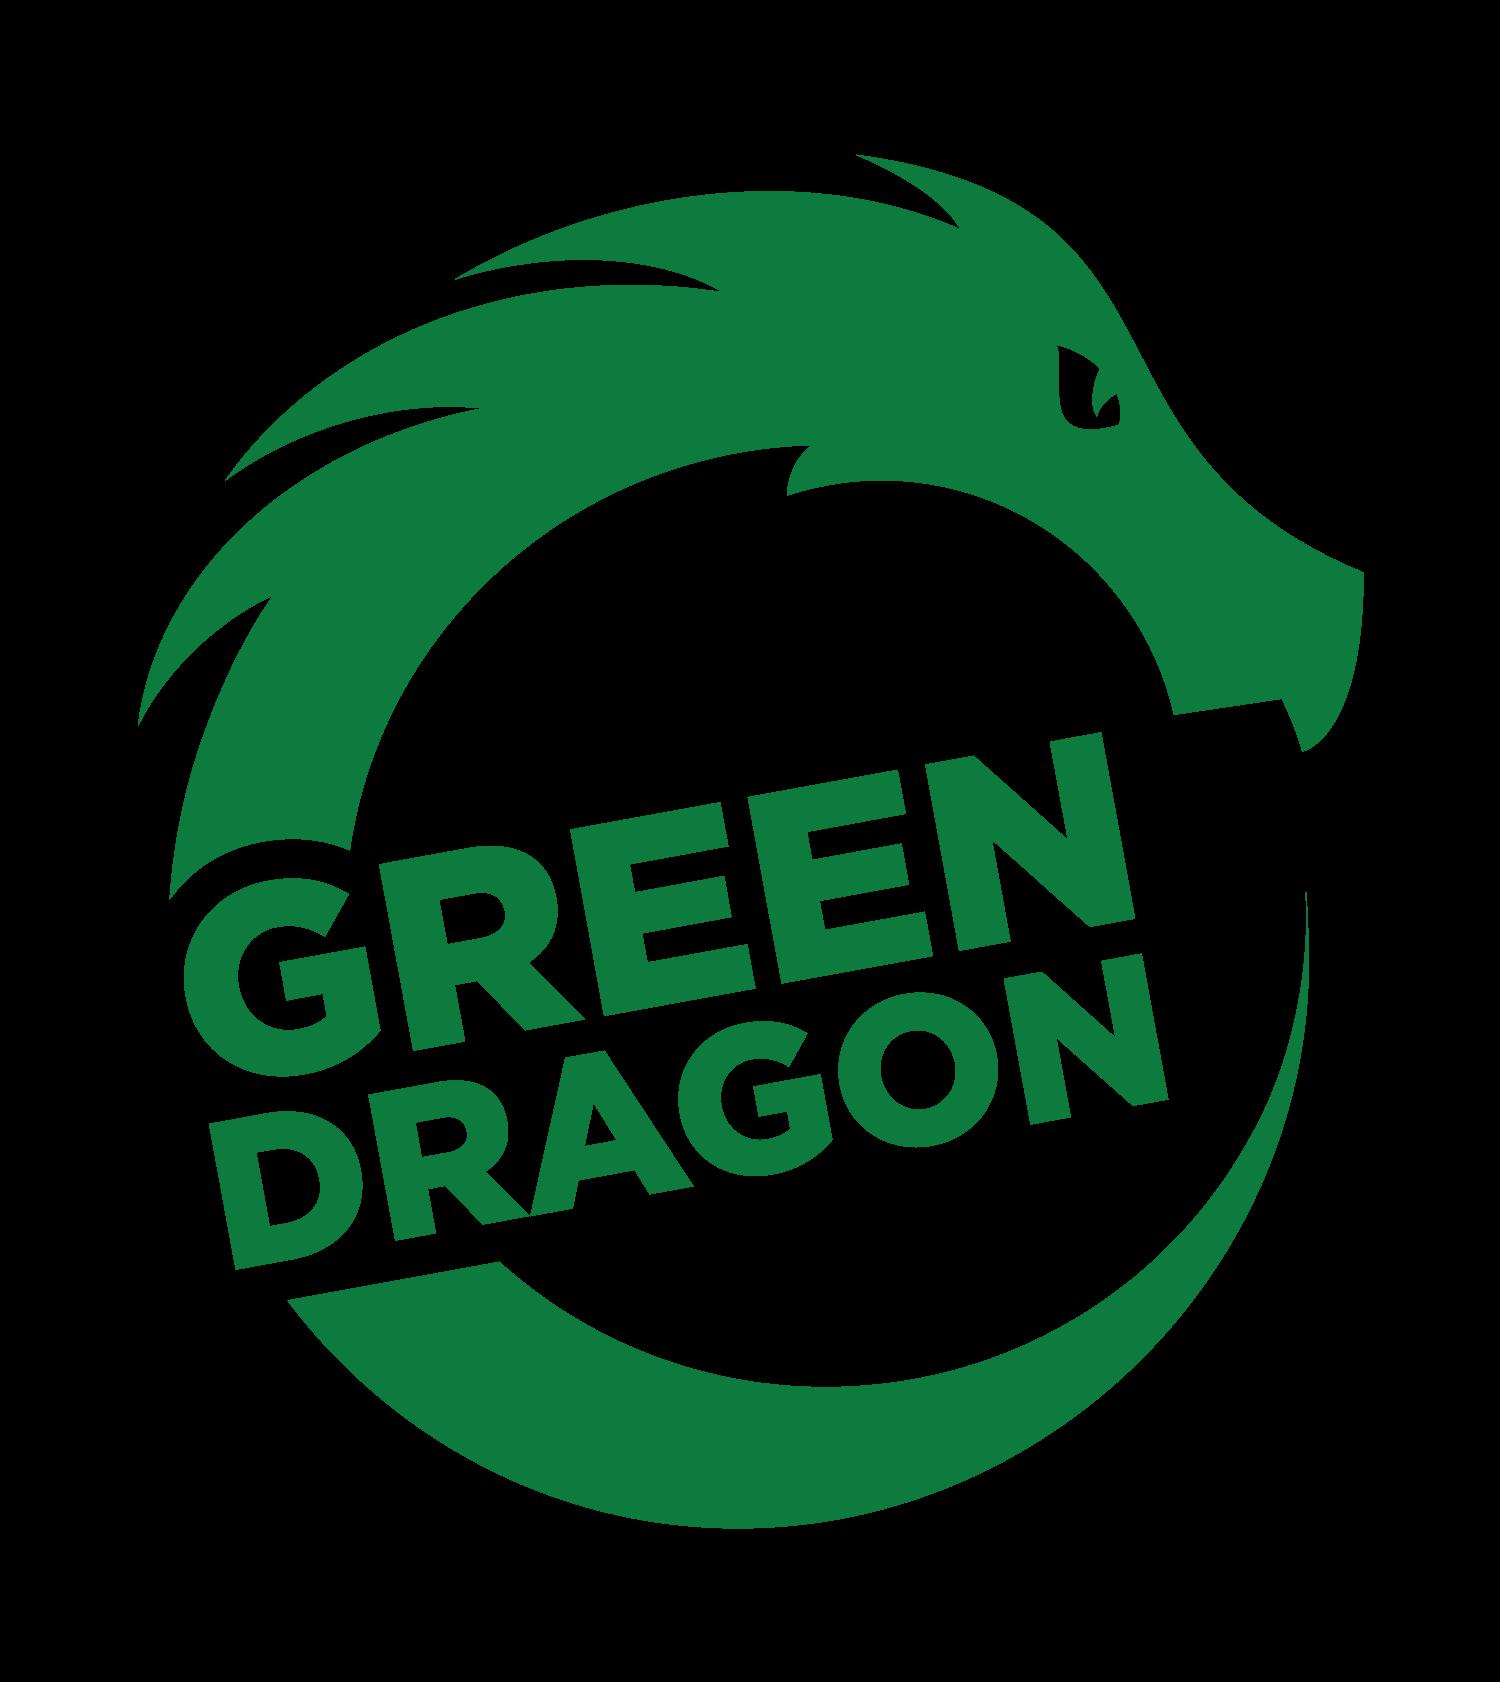 green-dragon-logo(1).png